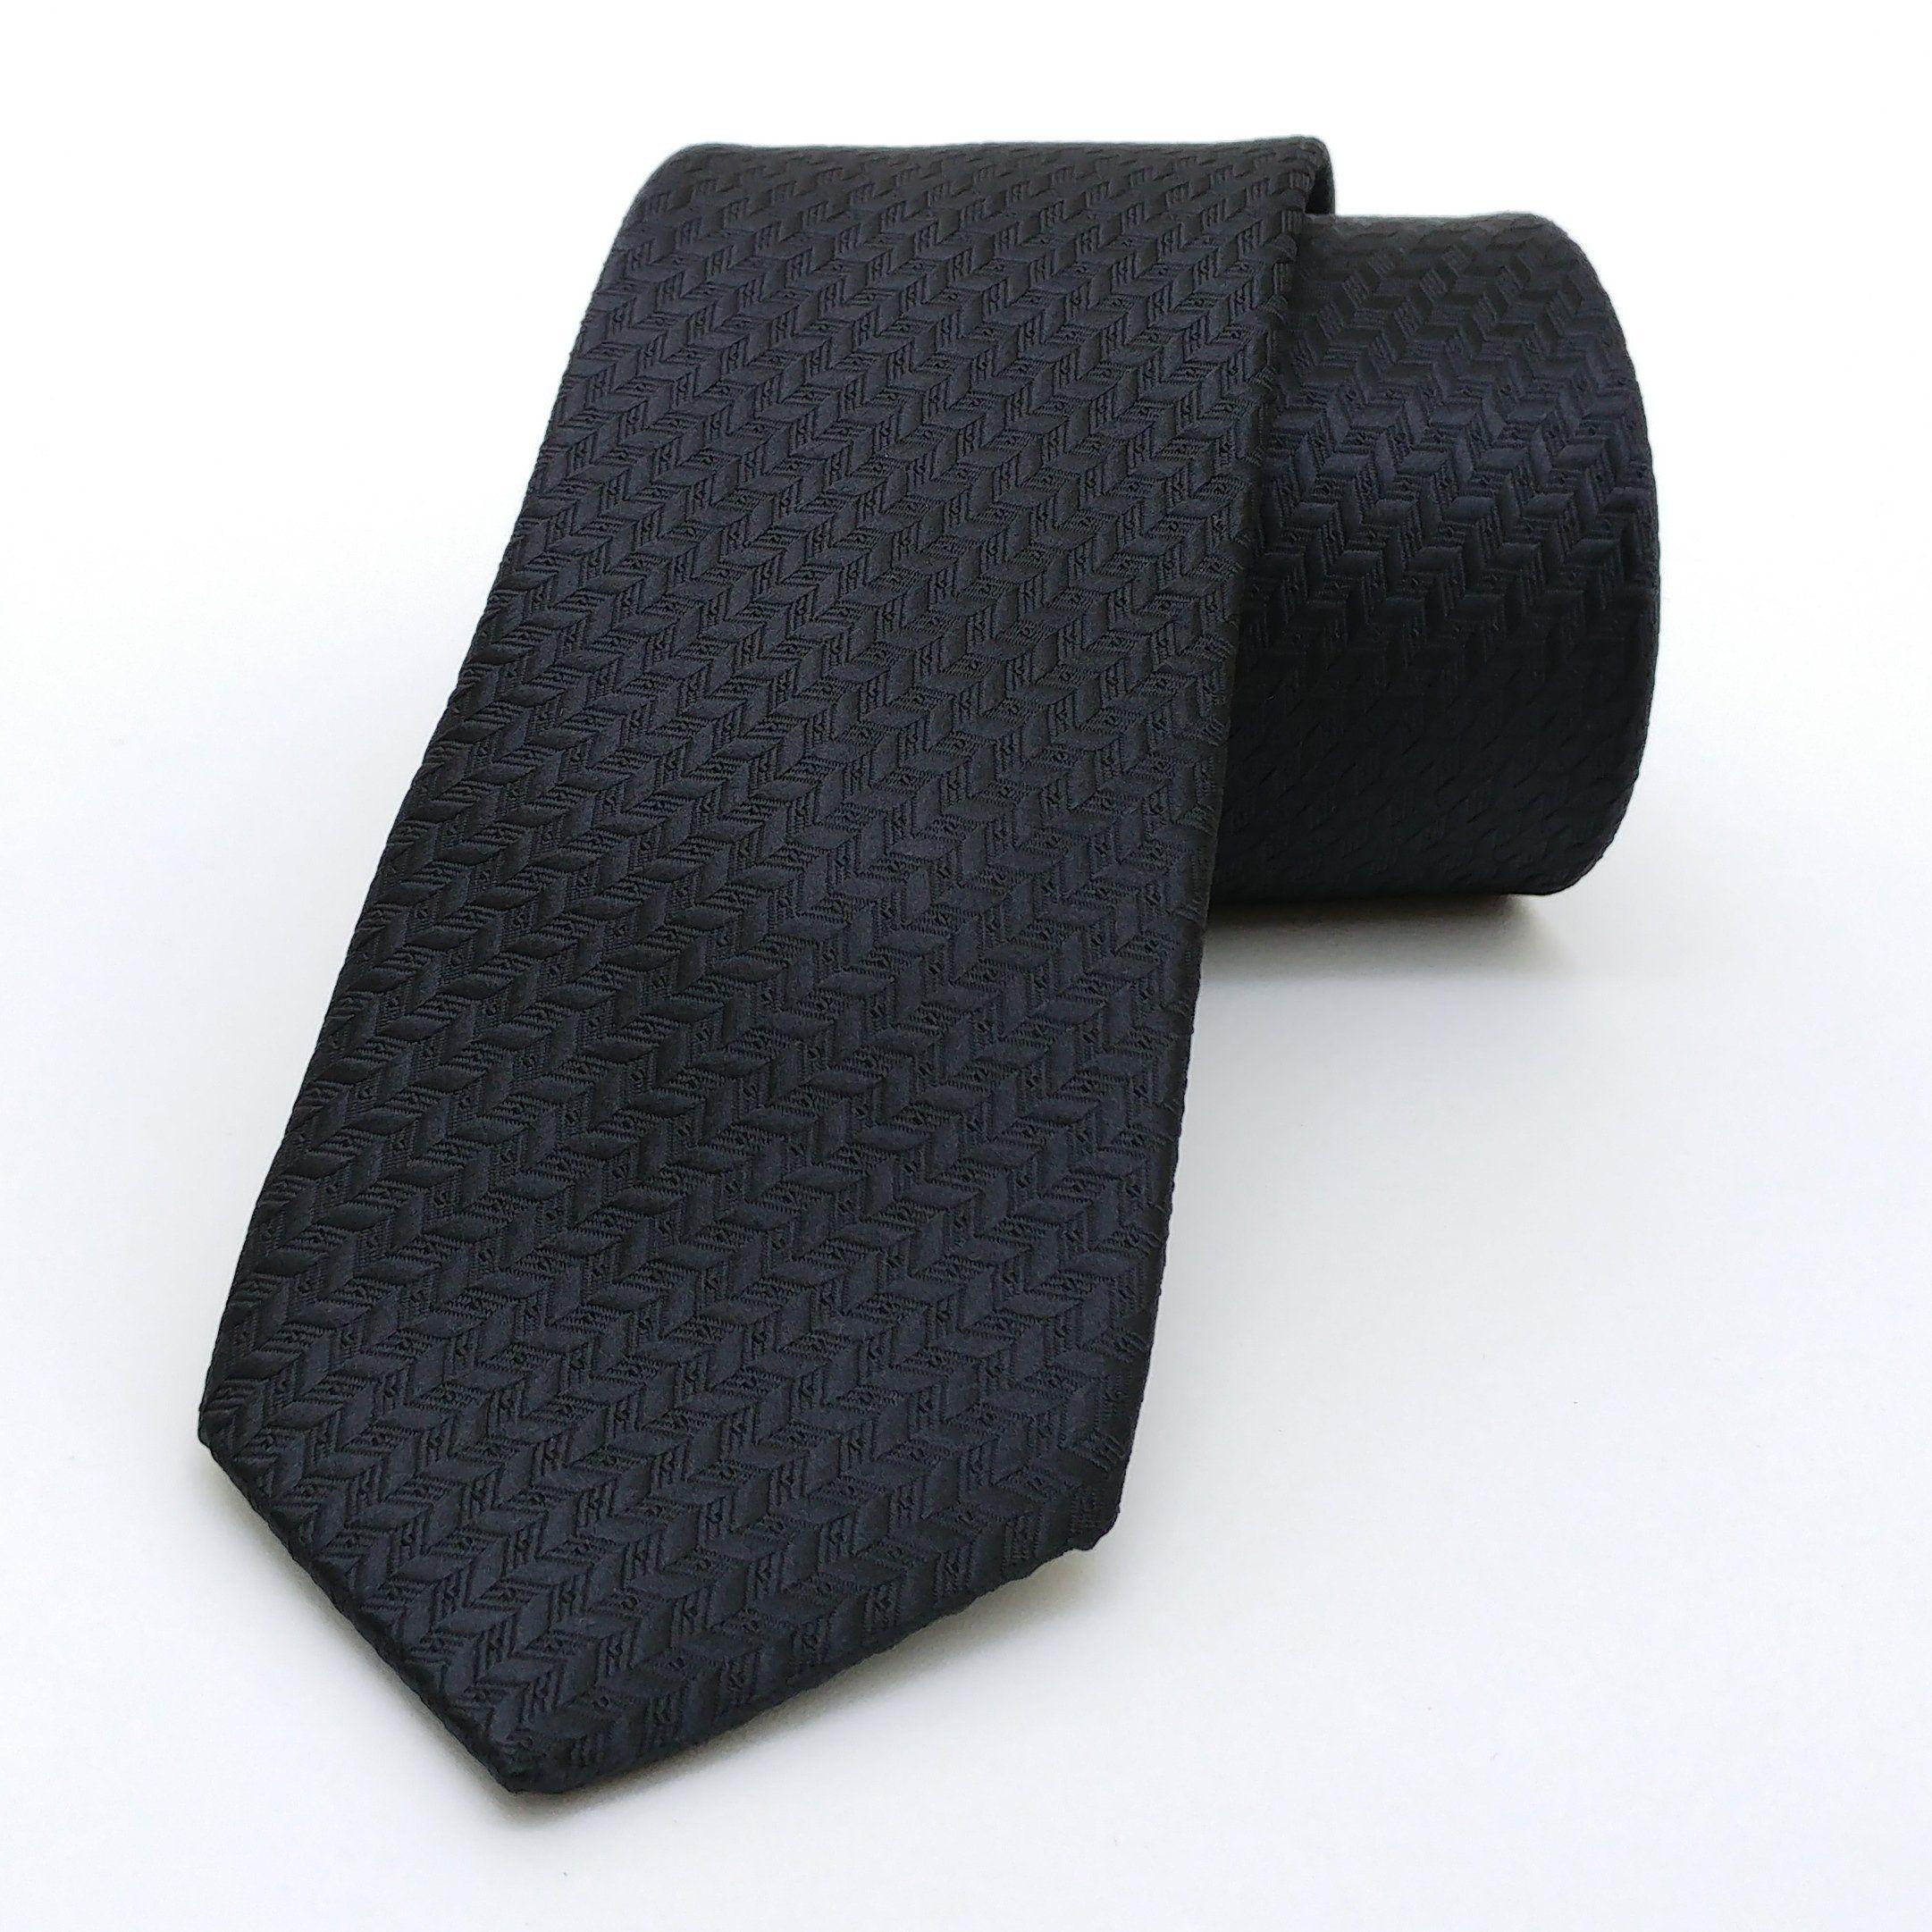 "Black dotted, herringbone men's tie 6 cm (2,36"") DK-605. Black stopped men's necktie DK-605 Width : 6 cm (2,36"") Length : 150 cm (59,06"")."